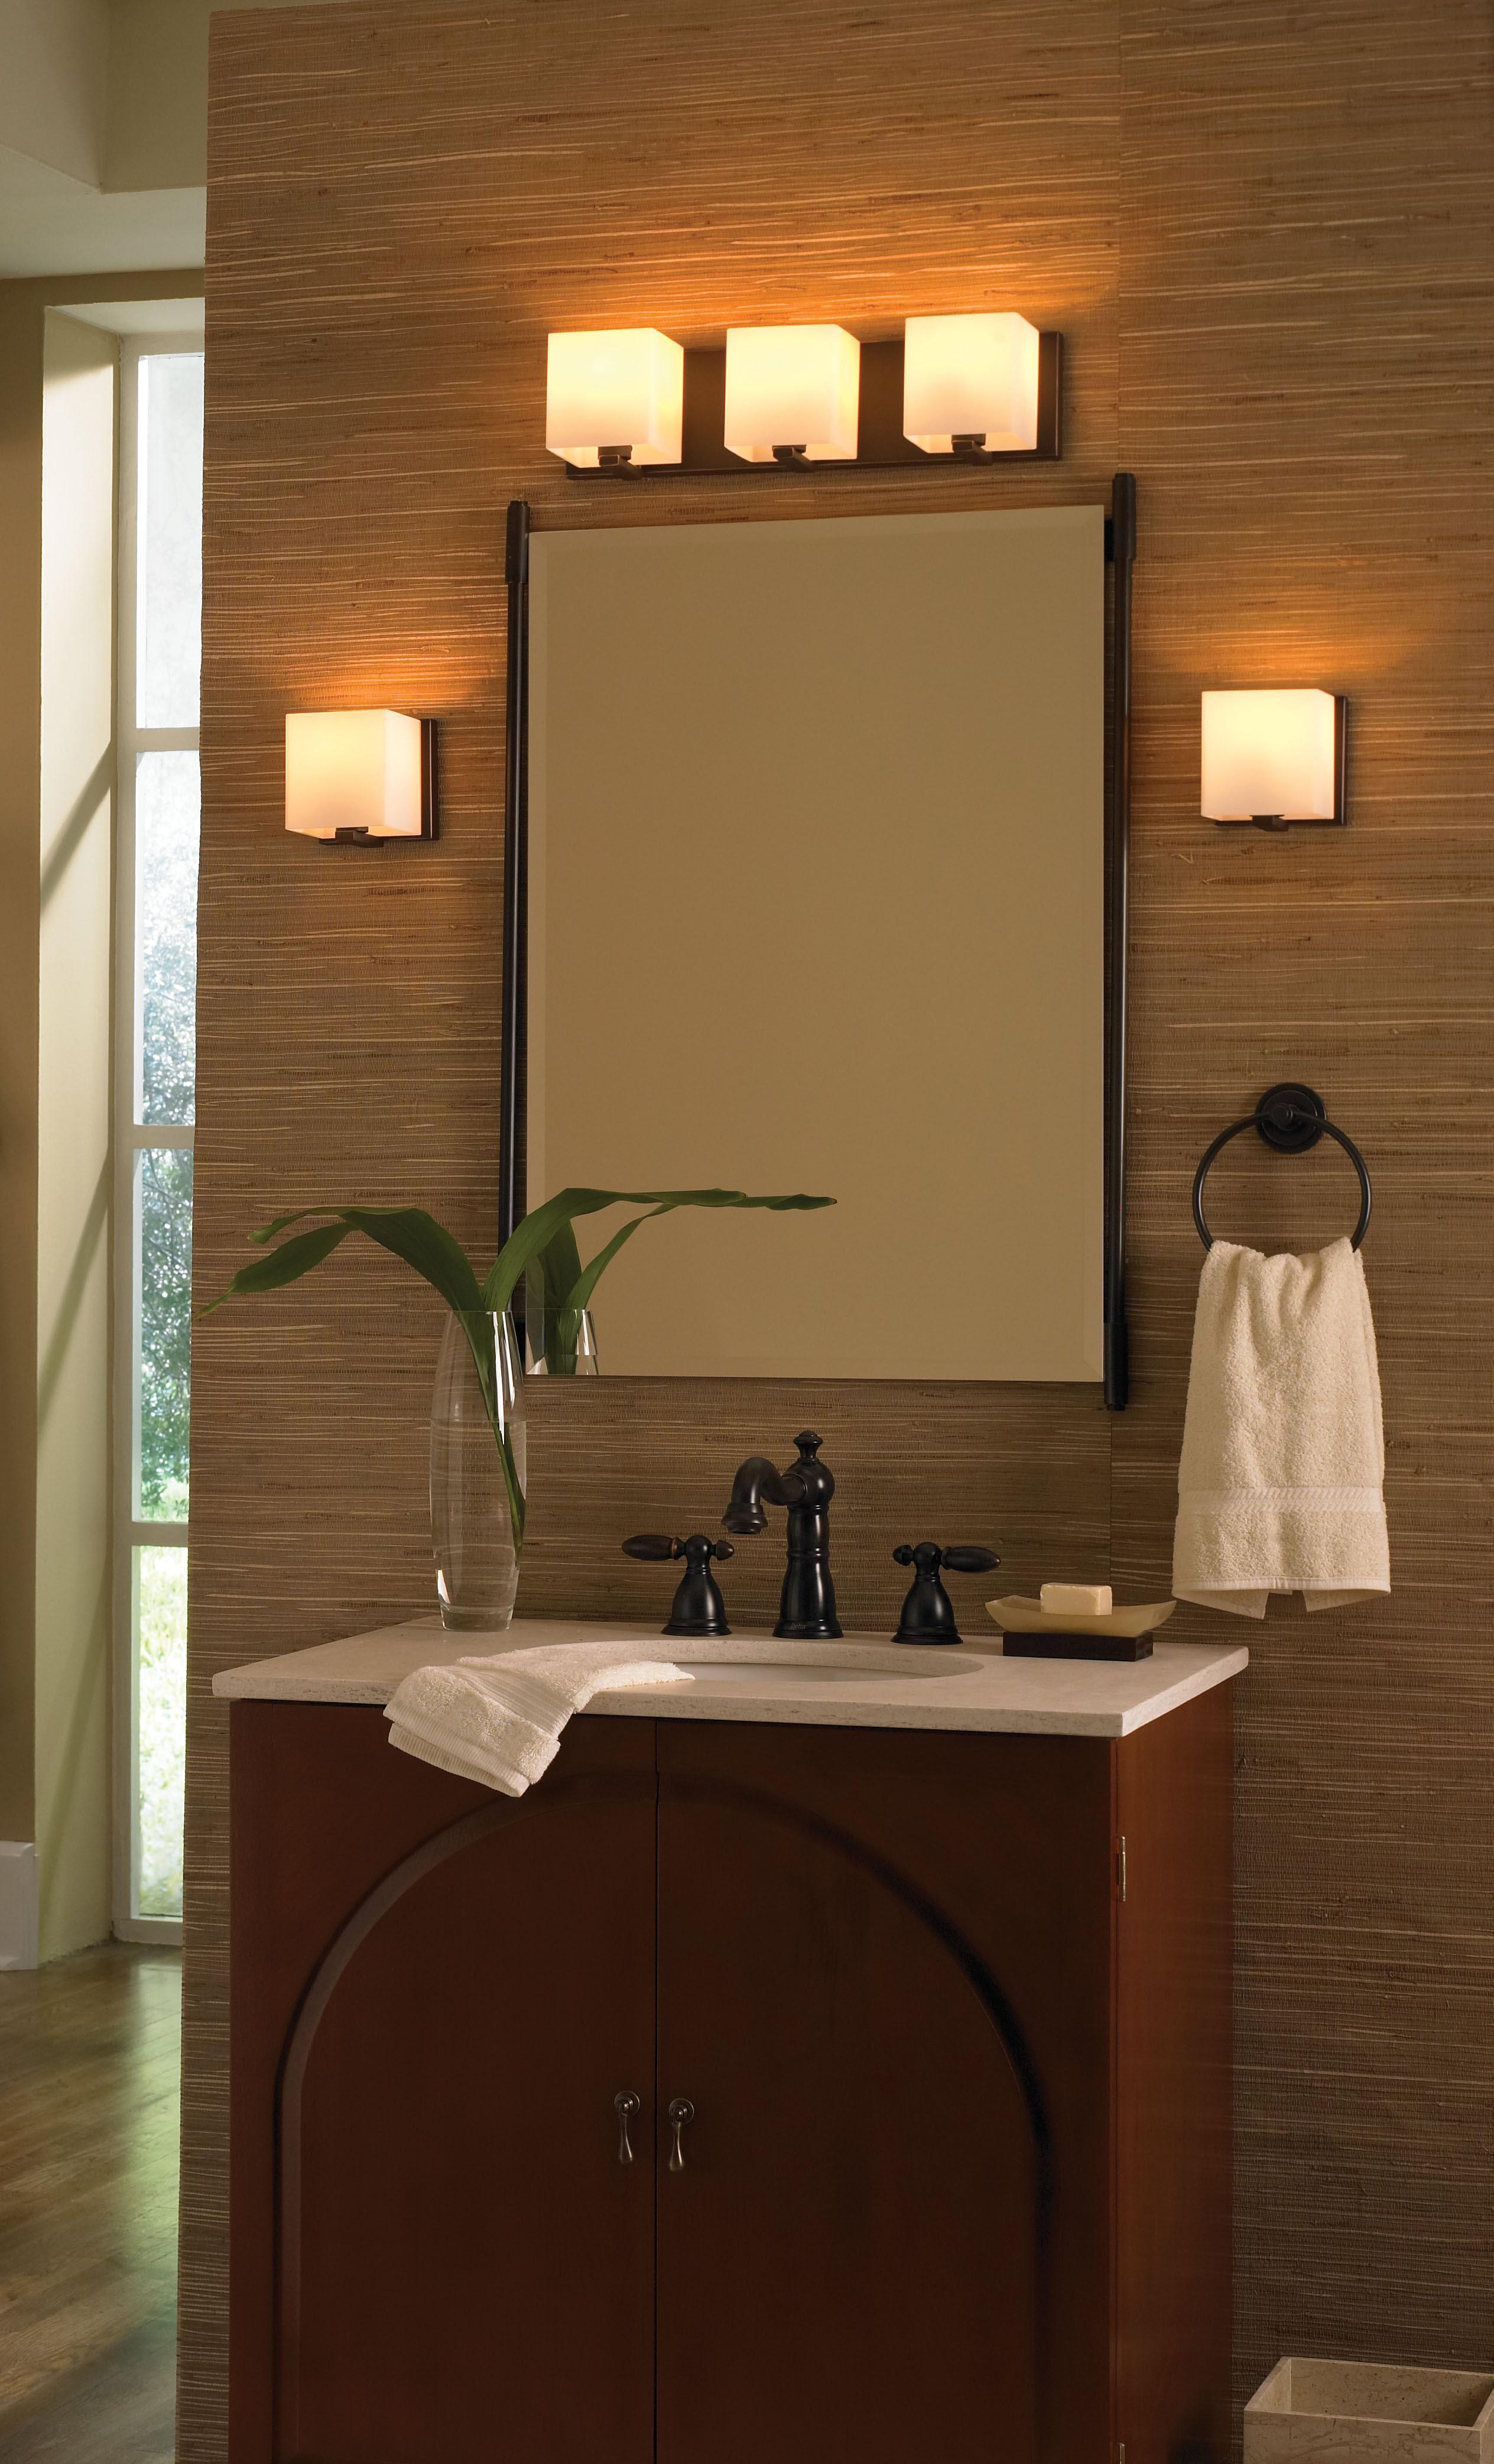 Lumens.com Highlights Favorites for Modern Bath Lighting ...